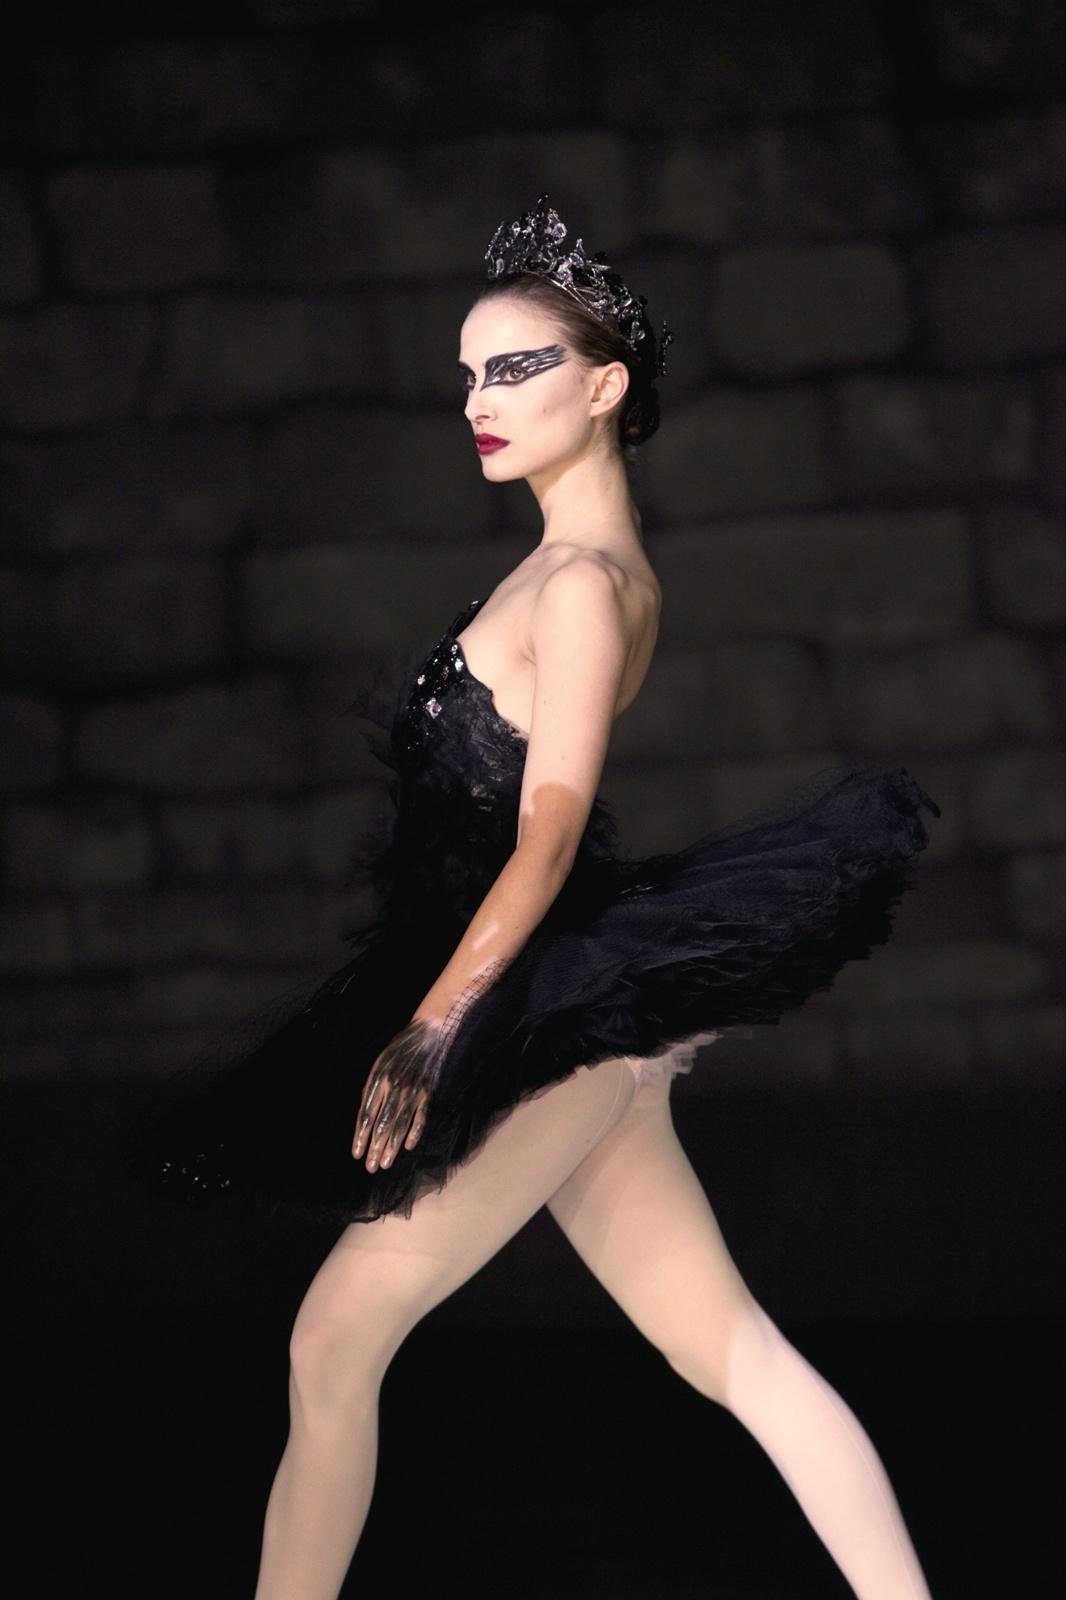 http://2.bp.blogspot.com/_H-kJiQUsu0U/TTIyc2-E_DI/AAAAAAAAAIY/8m5zBvU8LbM/s1600/natalie-portman-black-swan-promo-photo-004.jpg